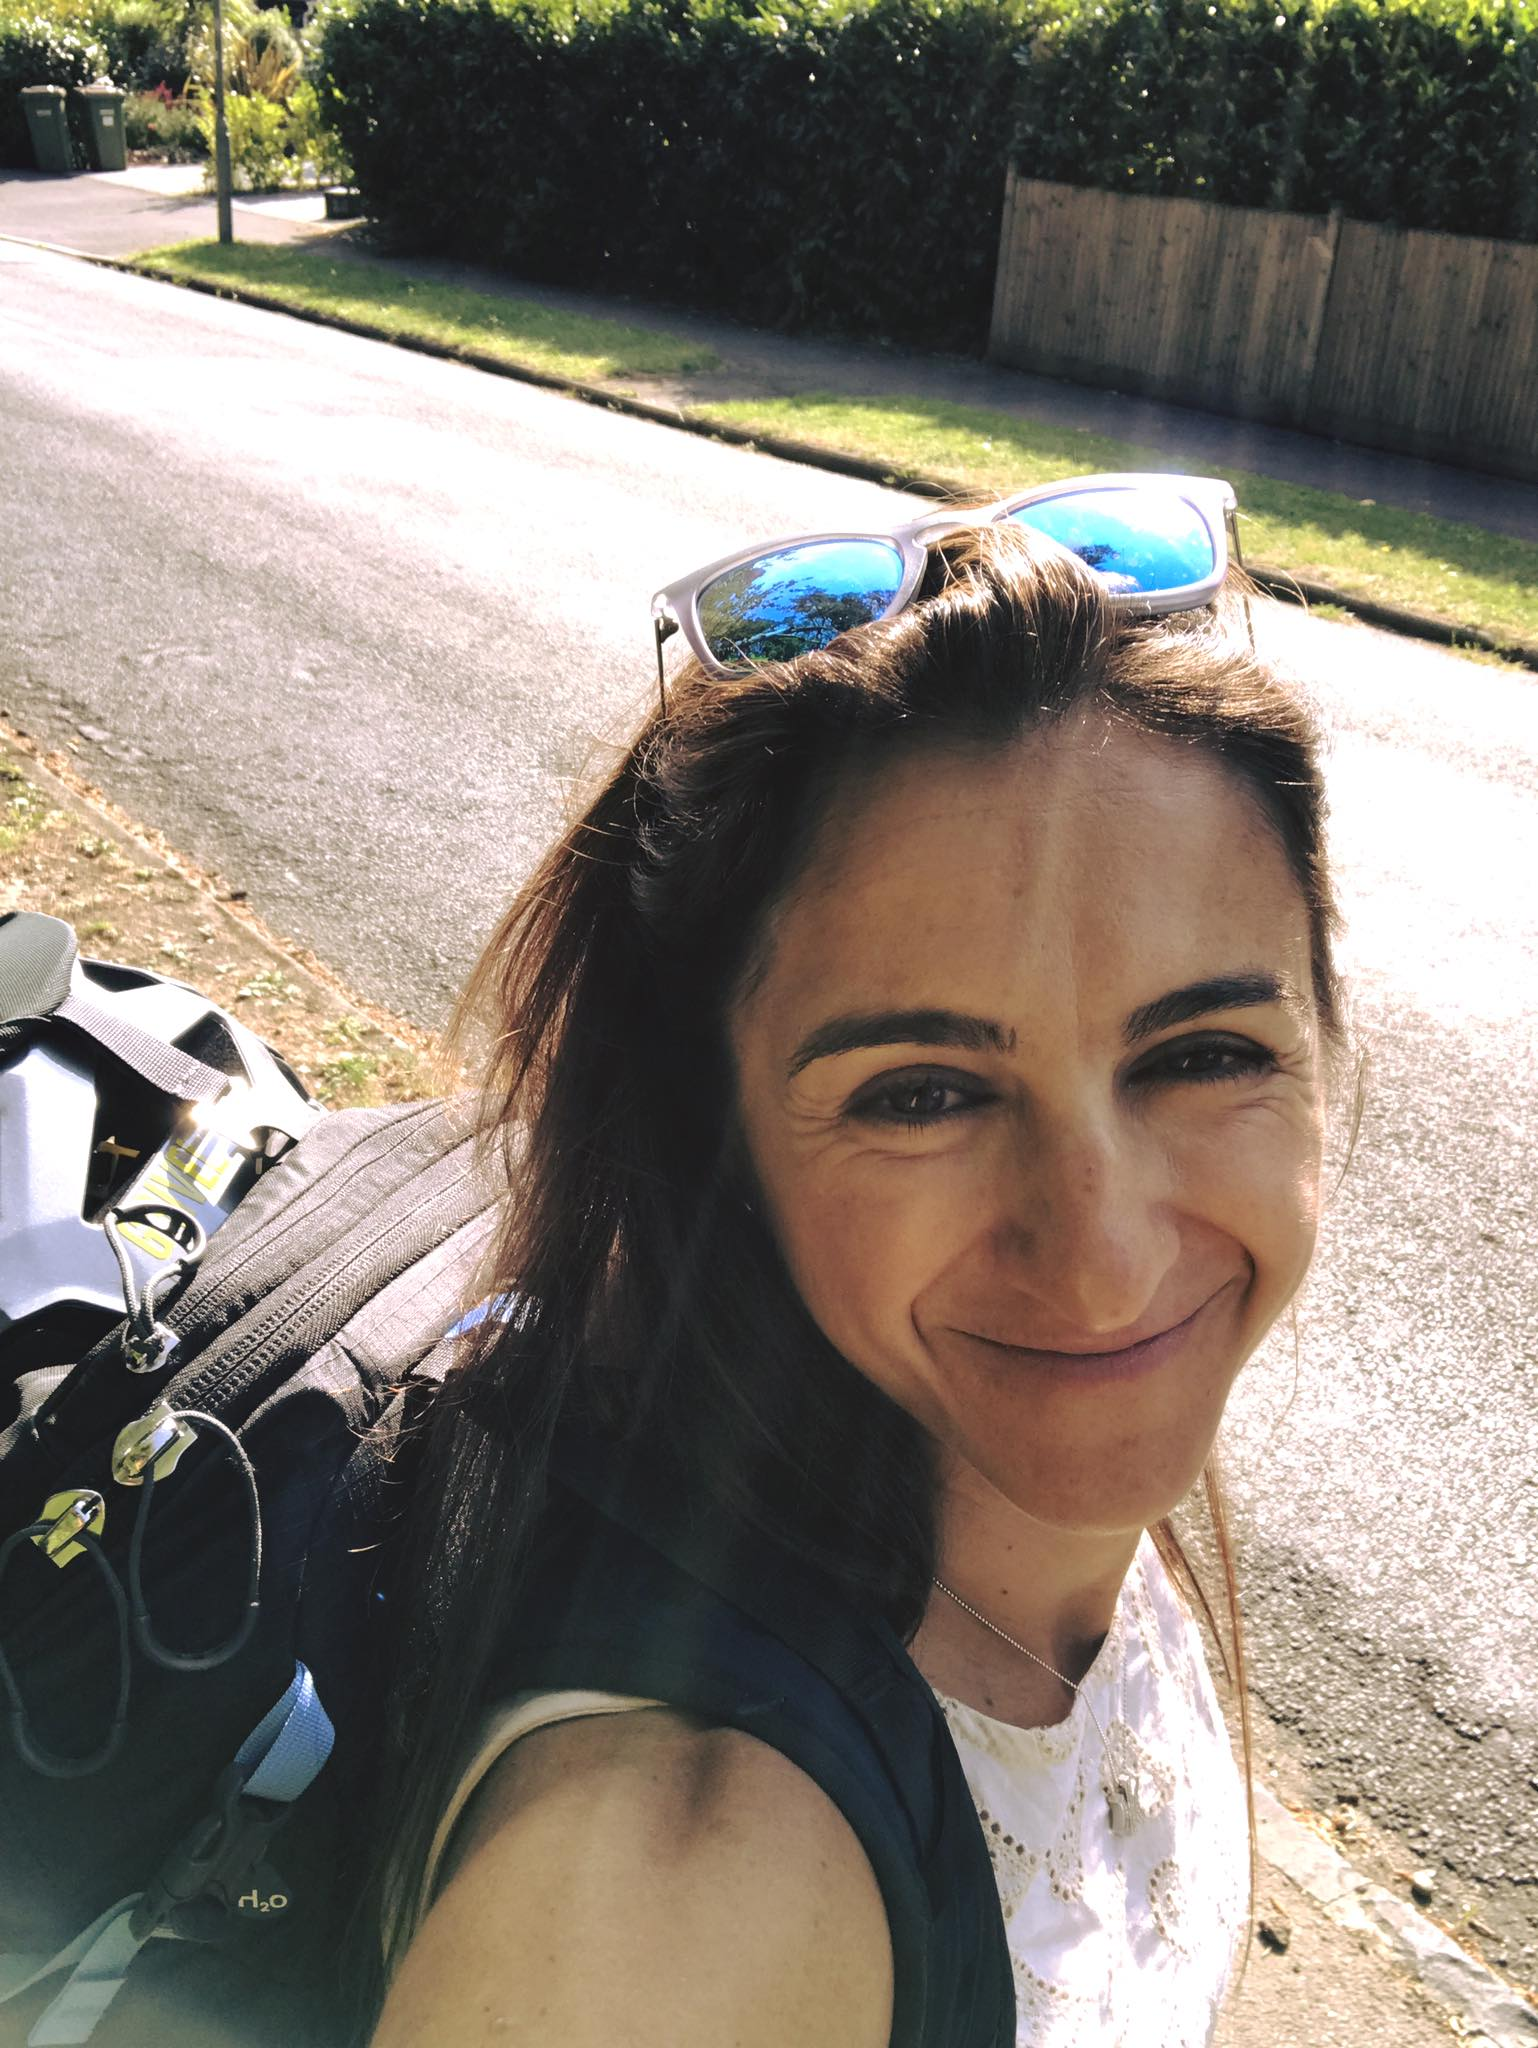 Shadi Ganjavian-Connor - Founder of TEAM GC